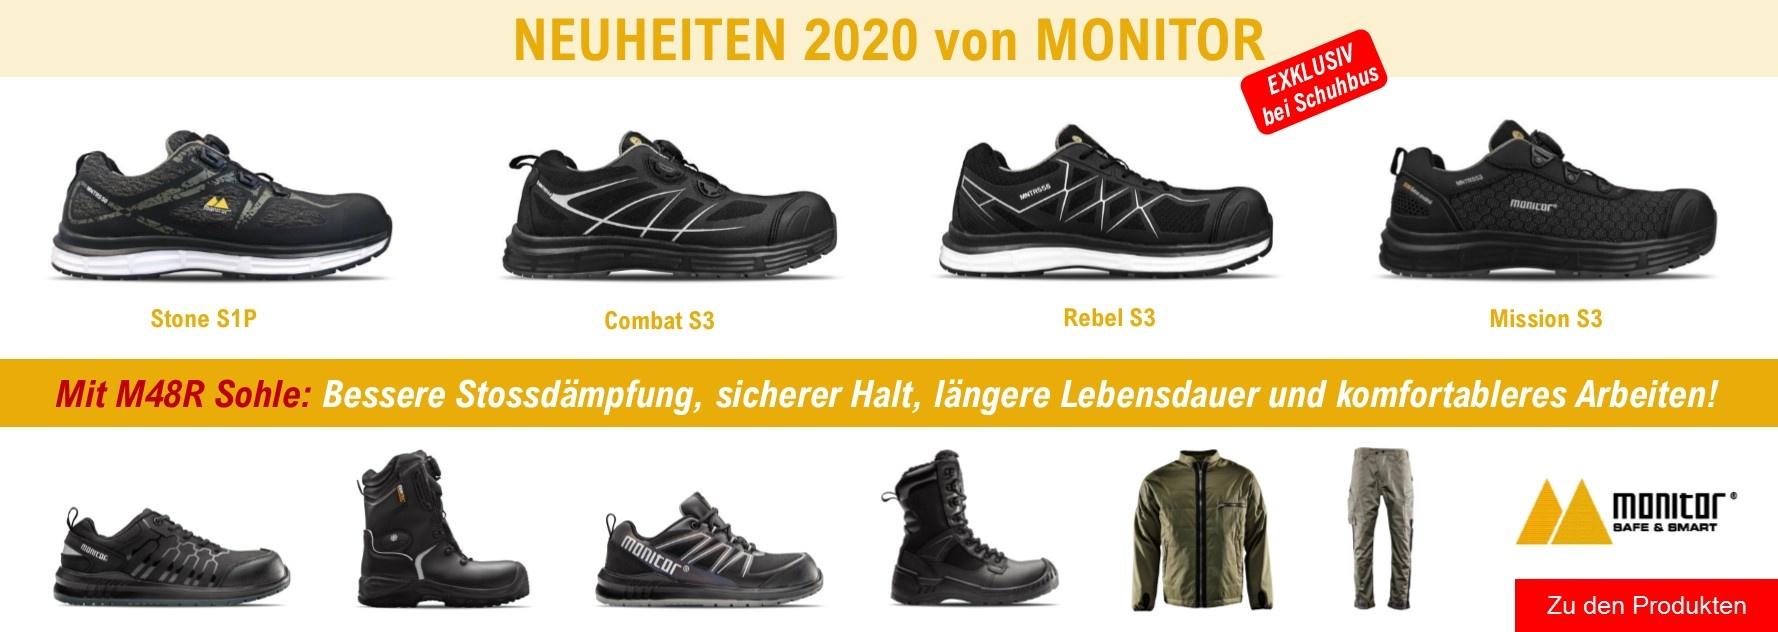 Monitor 2020 Slider